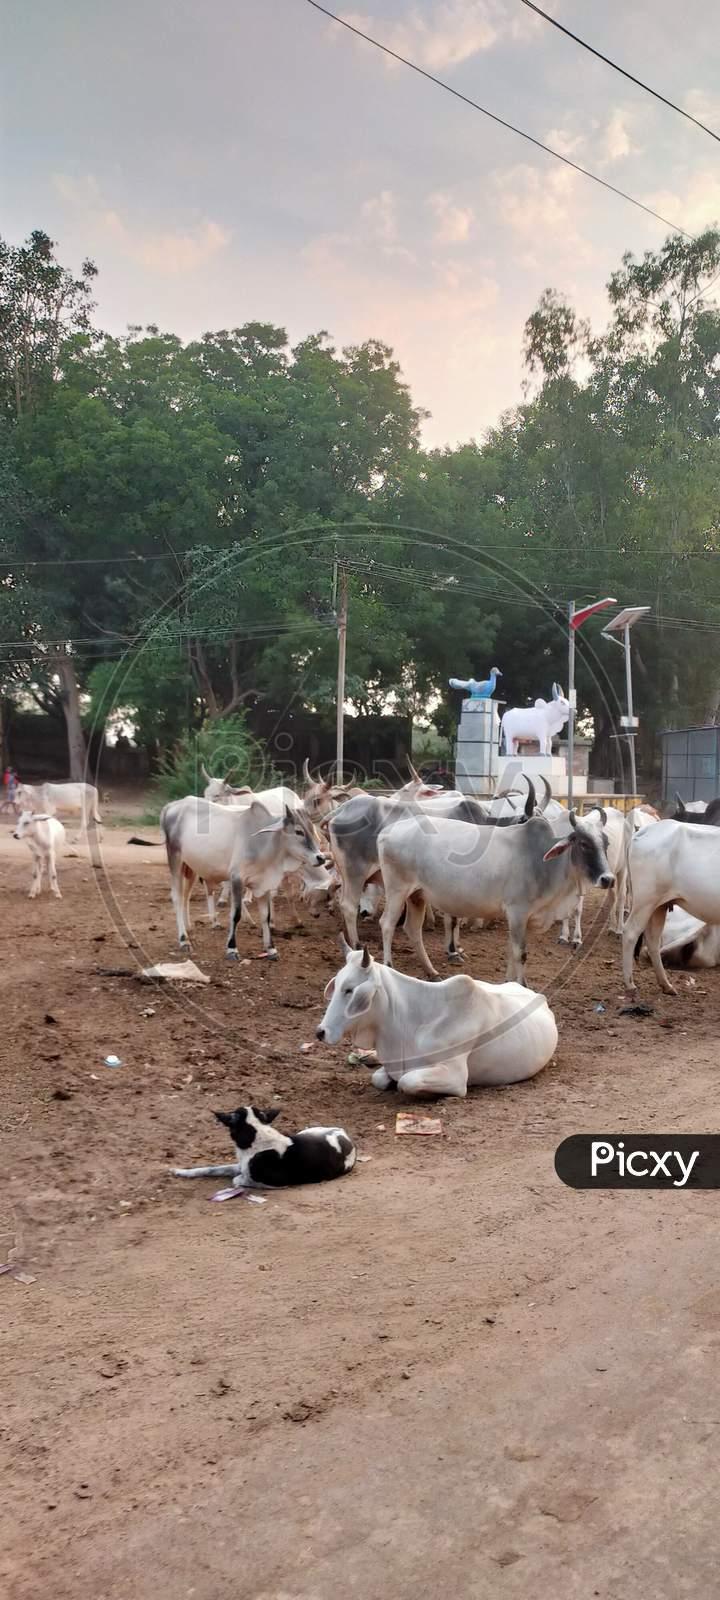 The herd of cows in village in Rajasthan